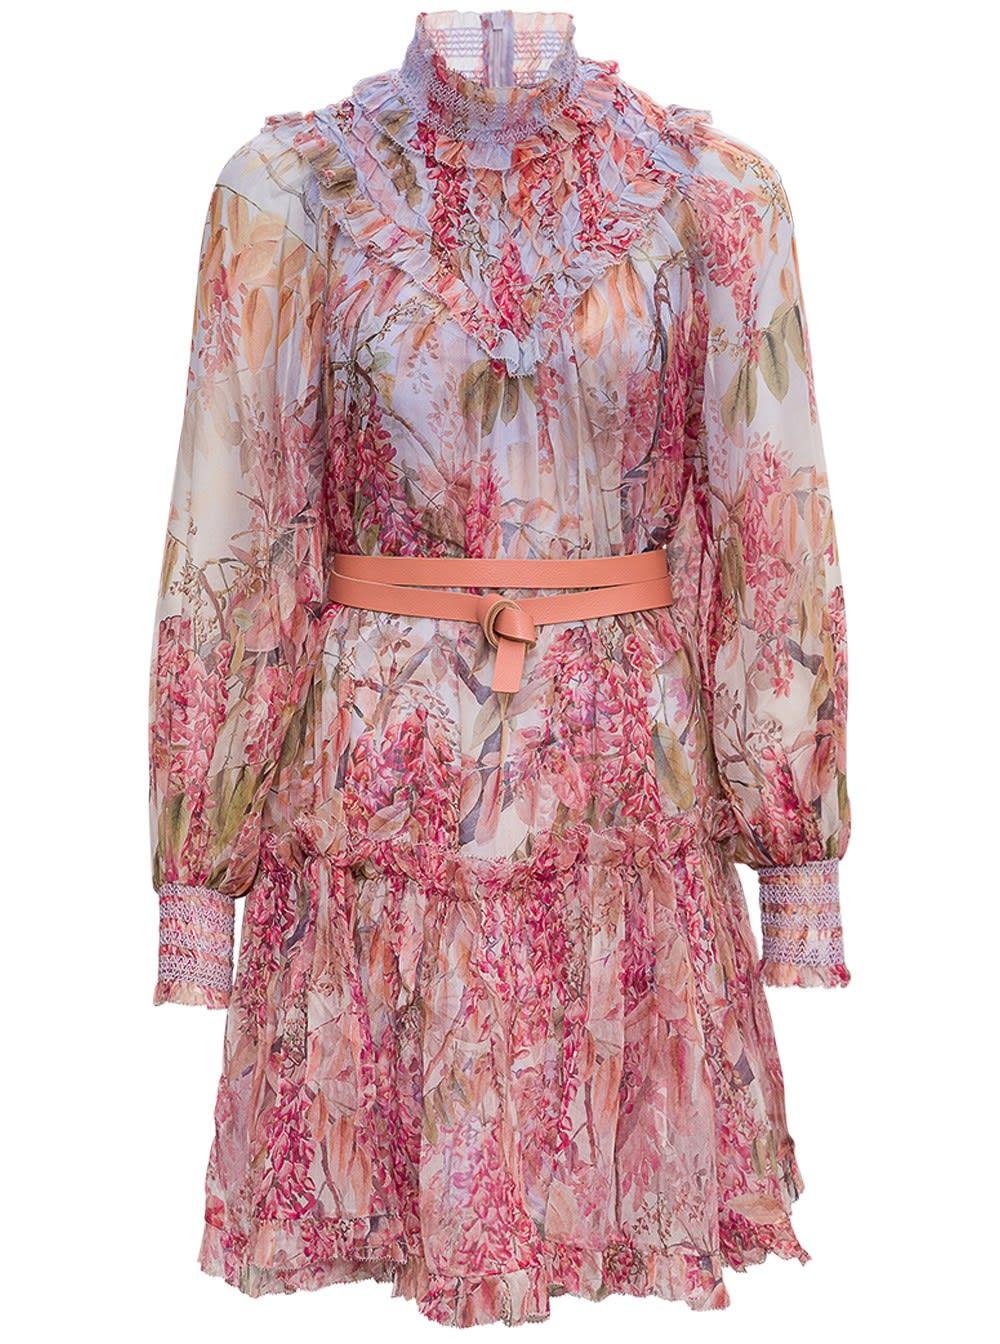 Buy Botanica Smocked Yoke Dress With Belt online, shop Zimmermann with free shipping